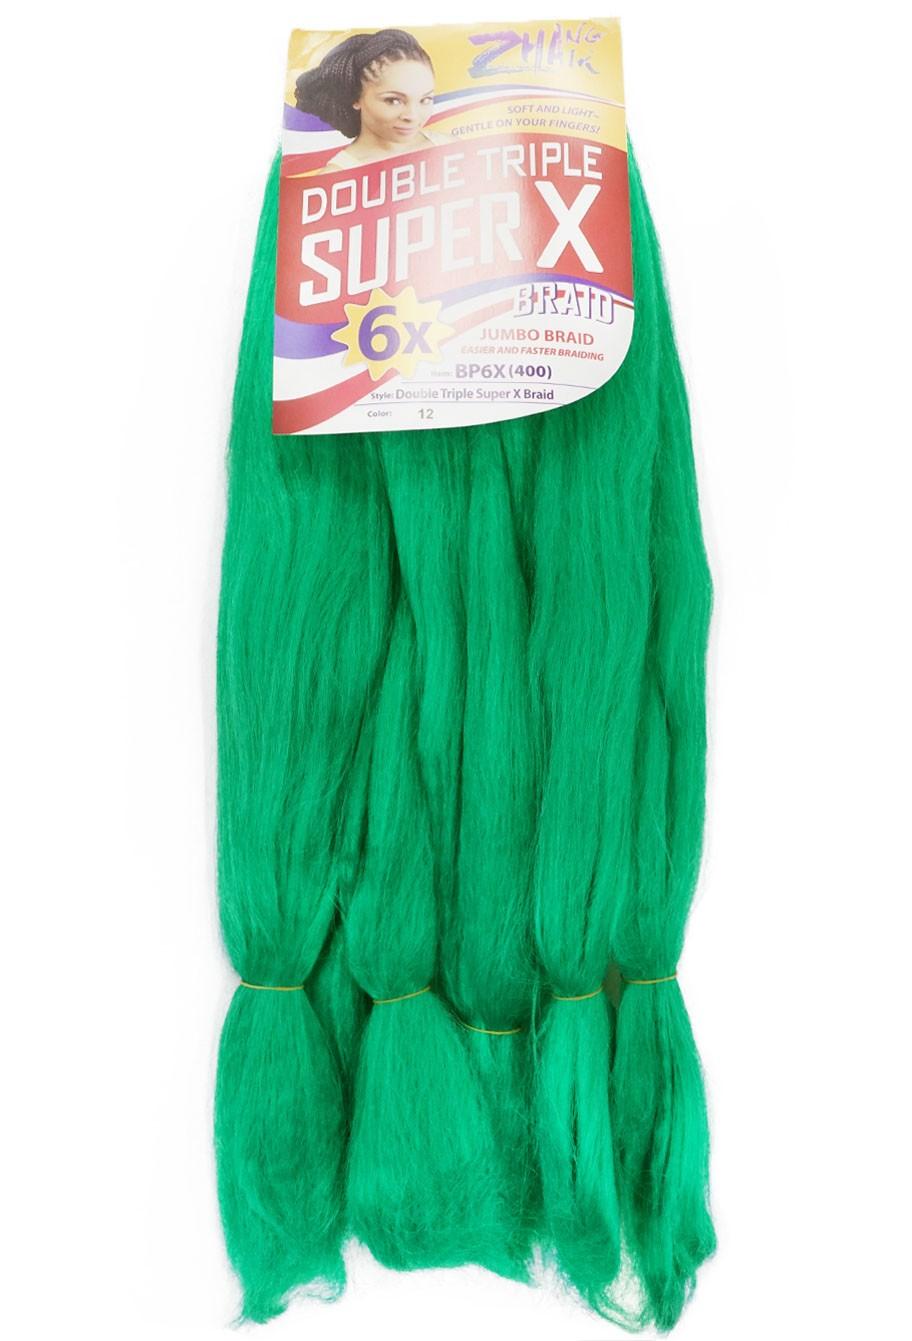 Cabelo Sintético - Zhang hair jumbo - Super X (400g) - Cor: Verde (12)